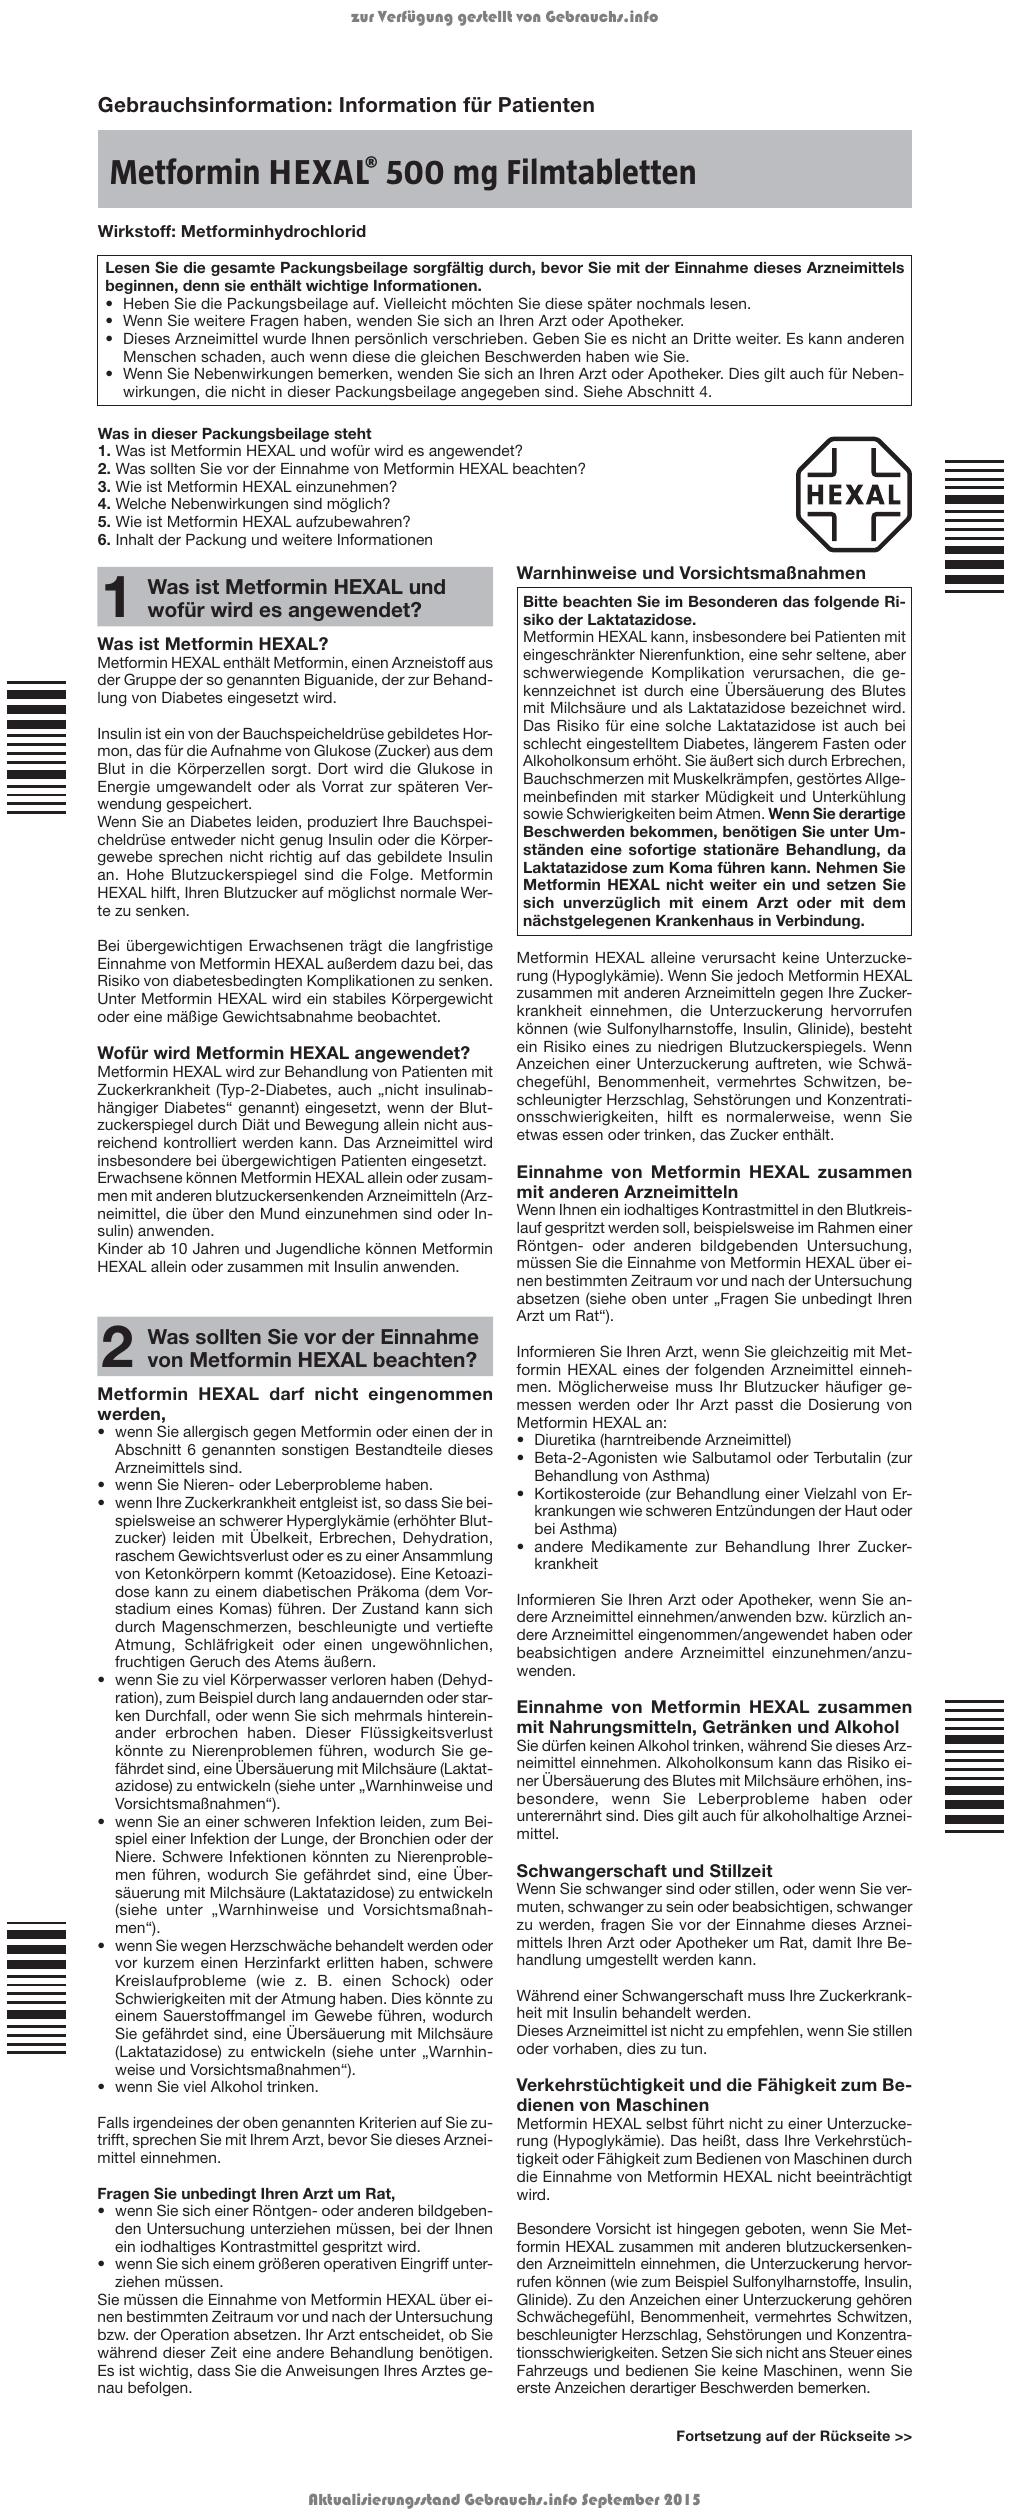 Metformin HEXAL® 500 mg Filmtabletten